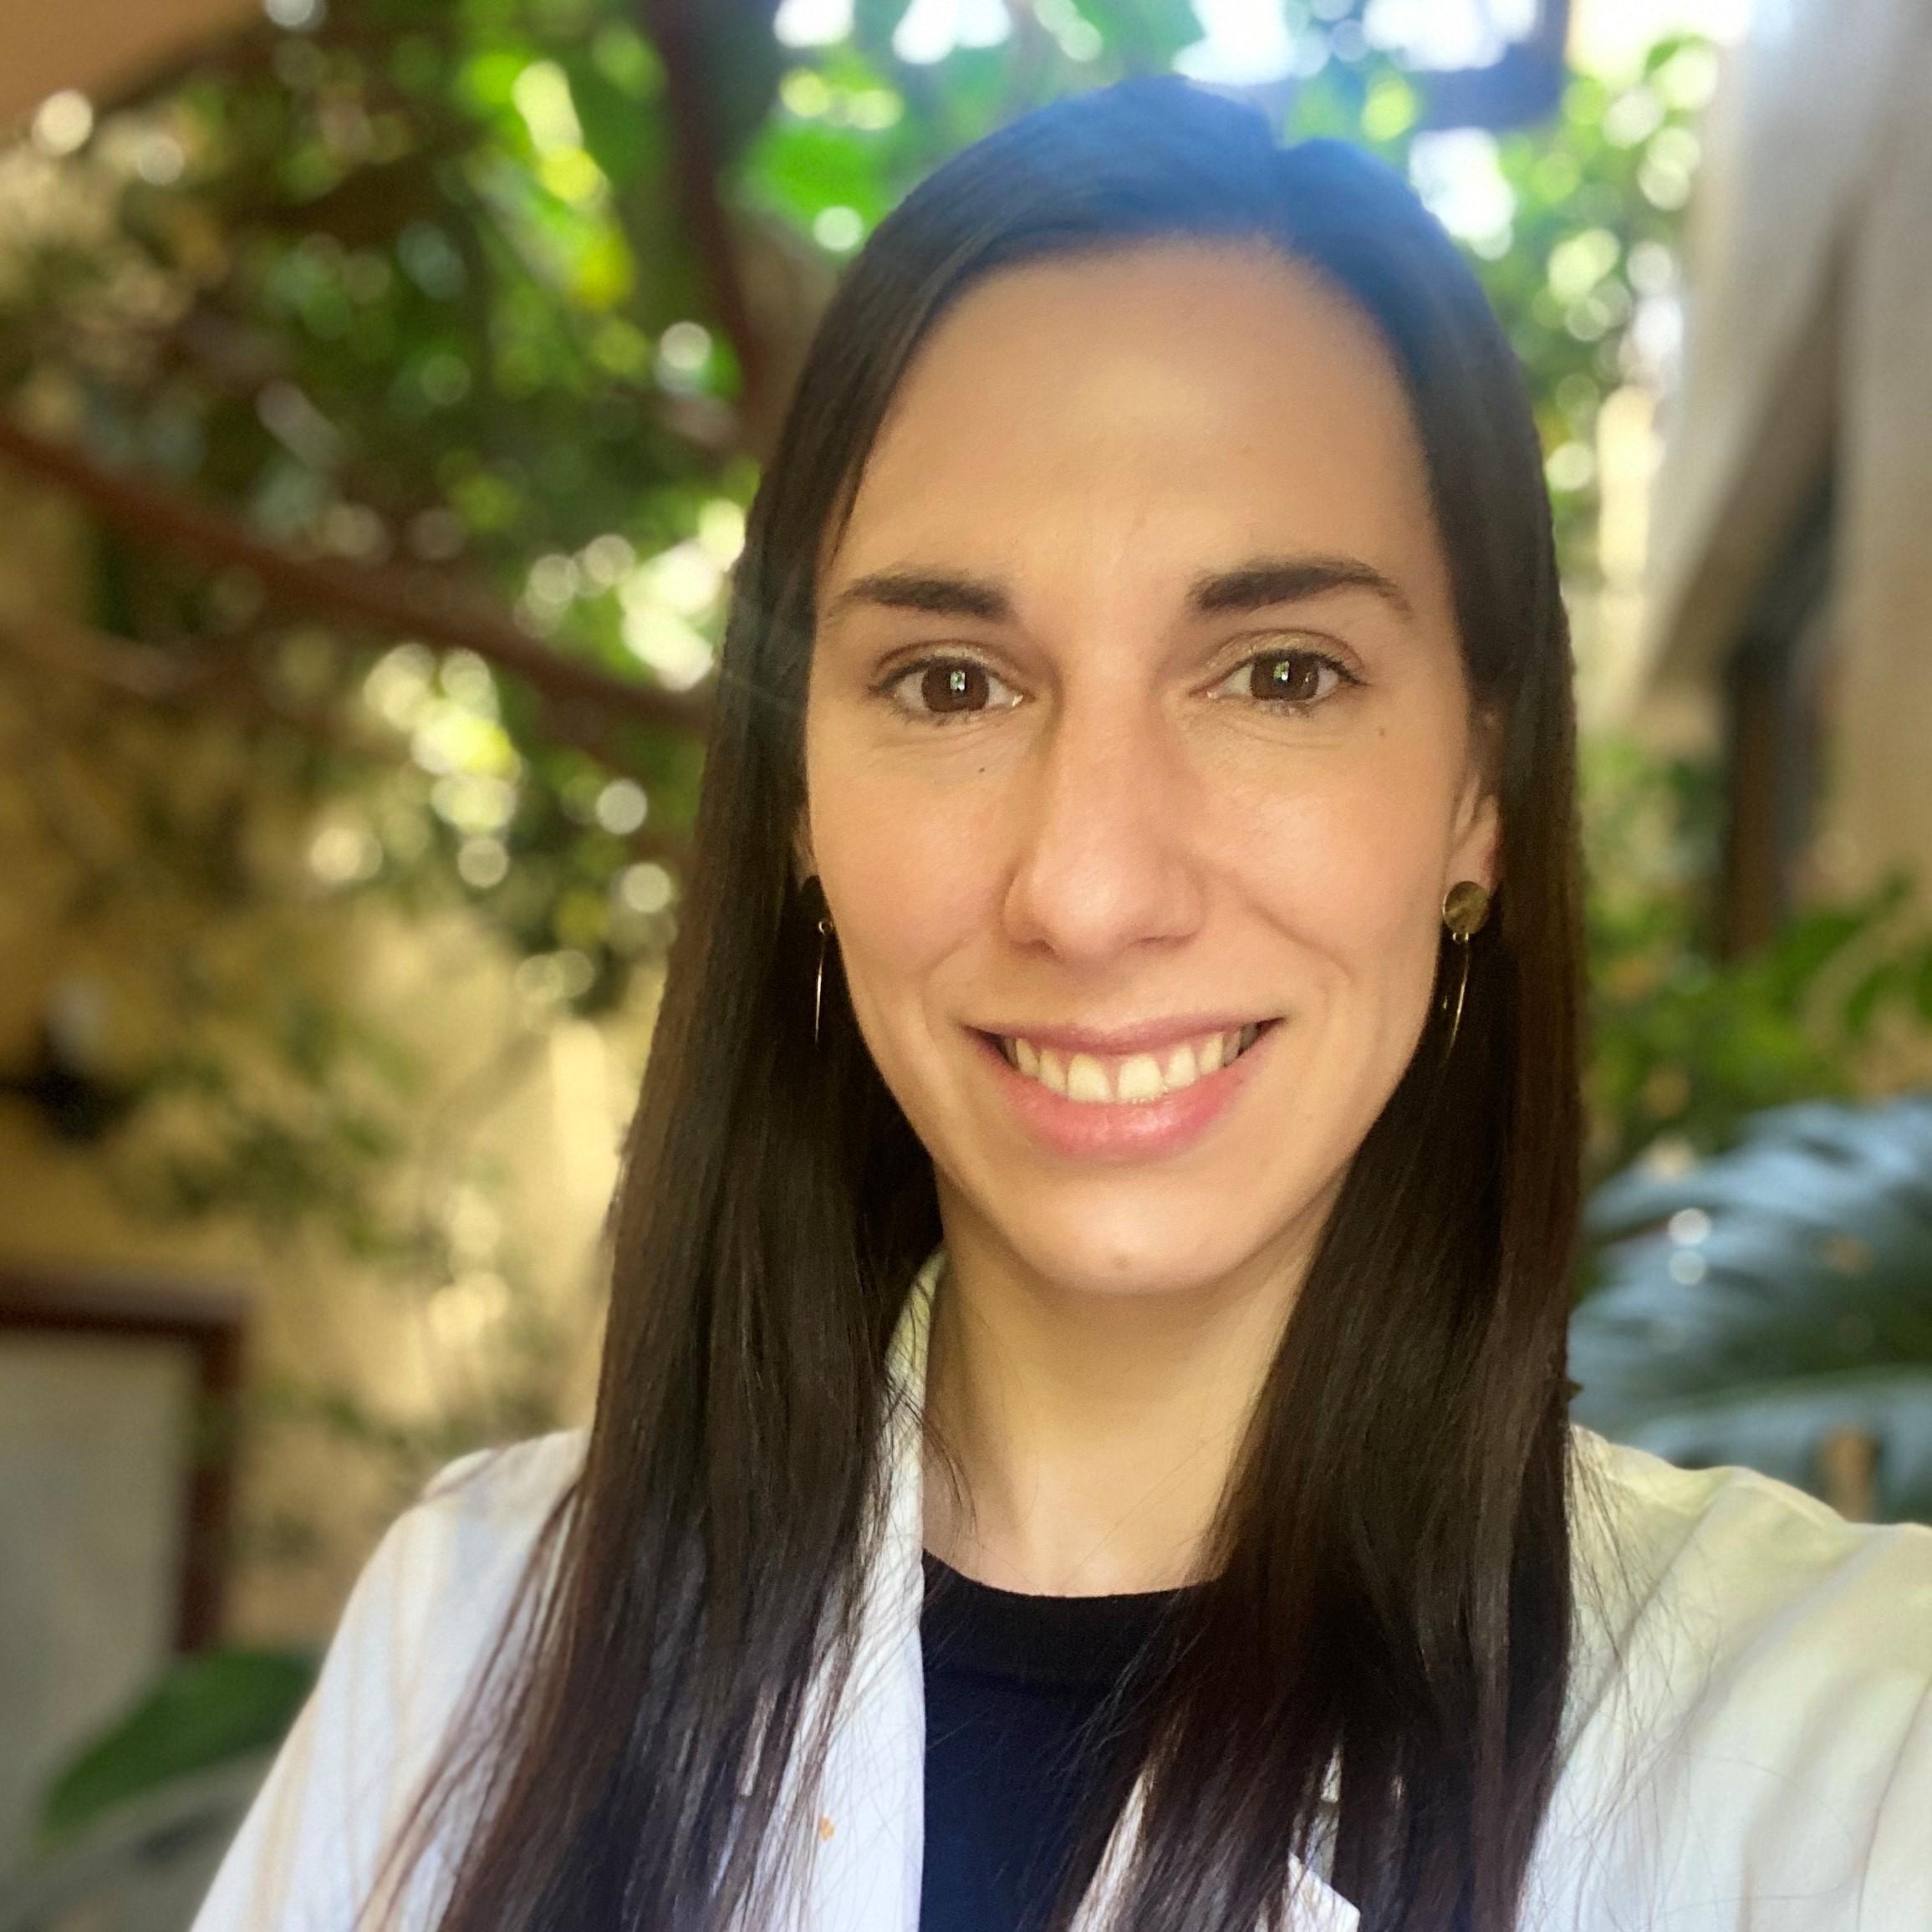 ELISA ORLANDINI SANCHEZ